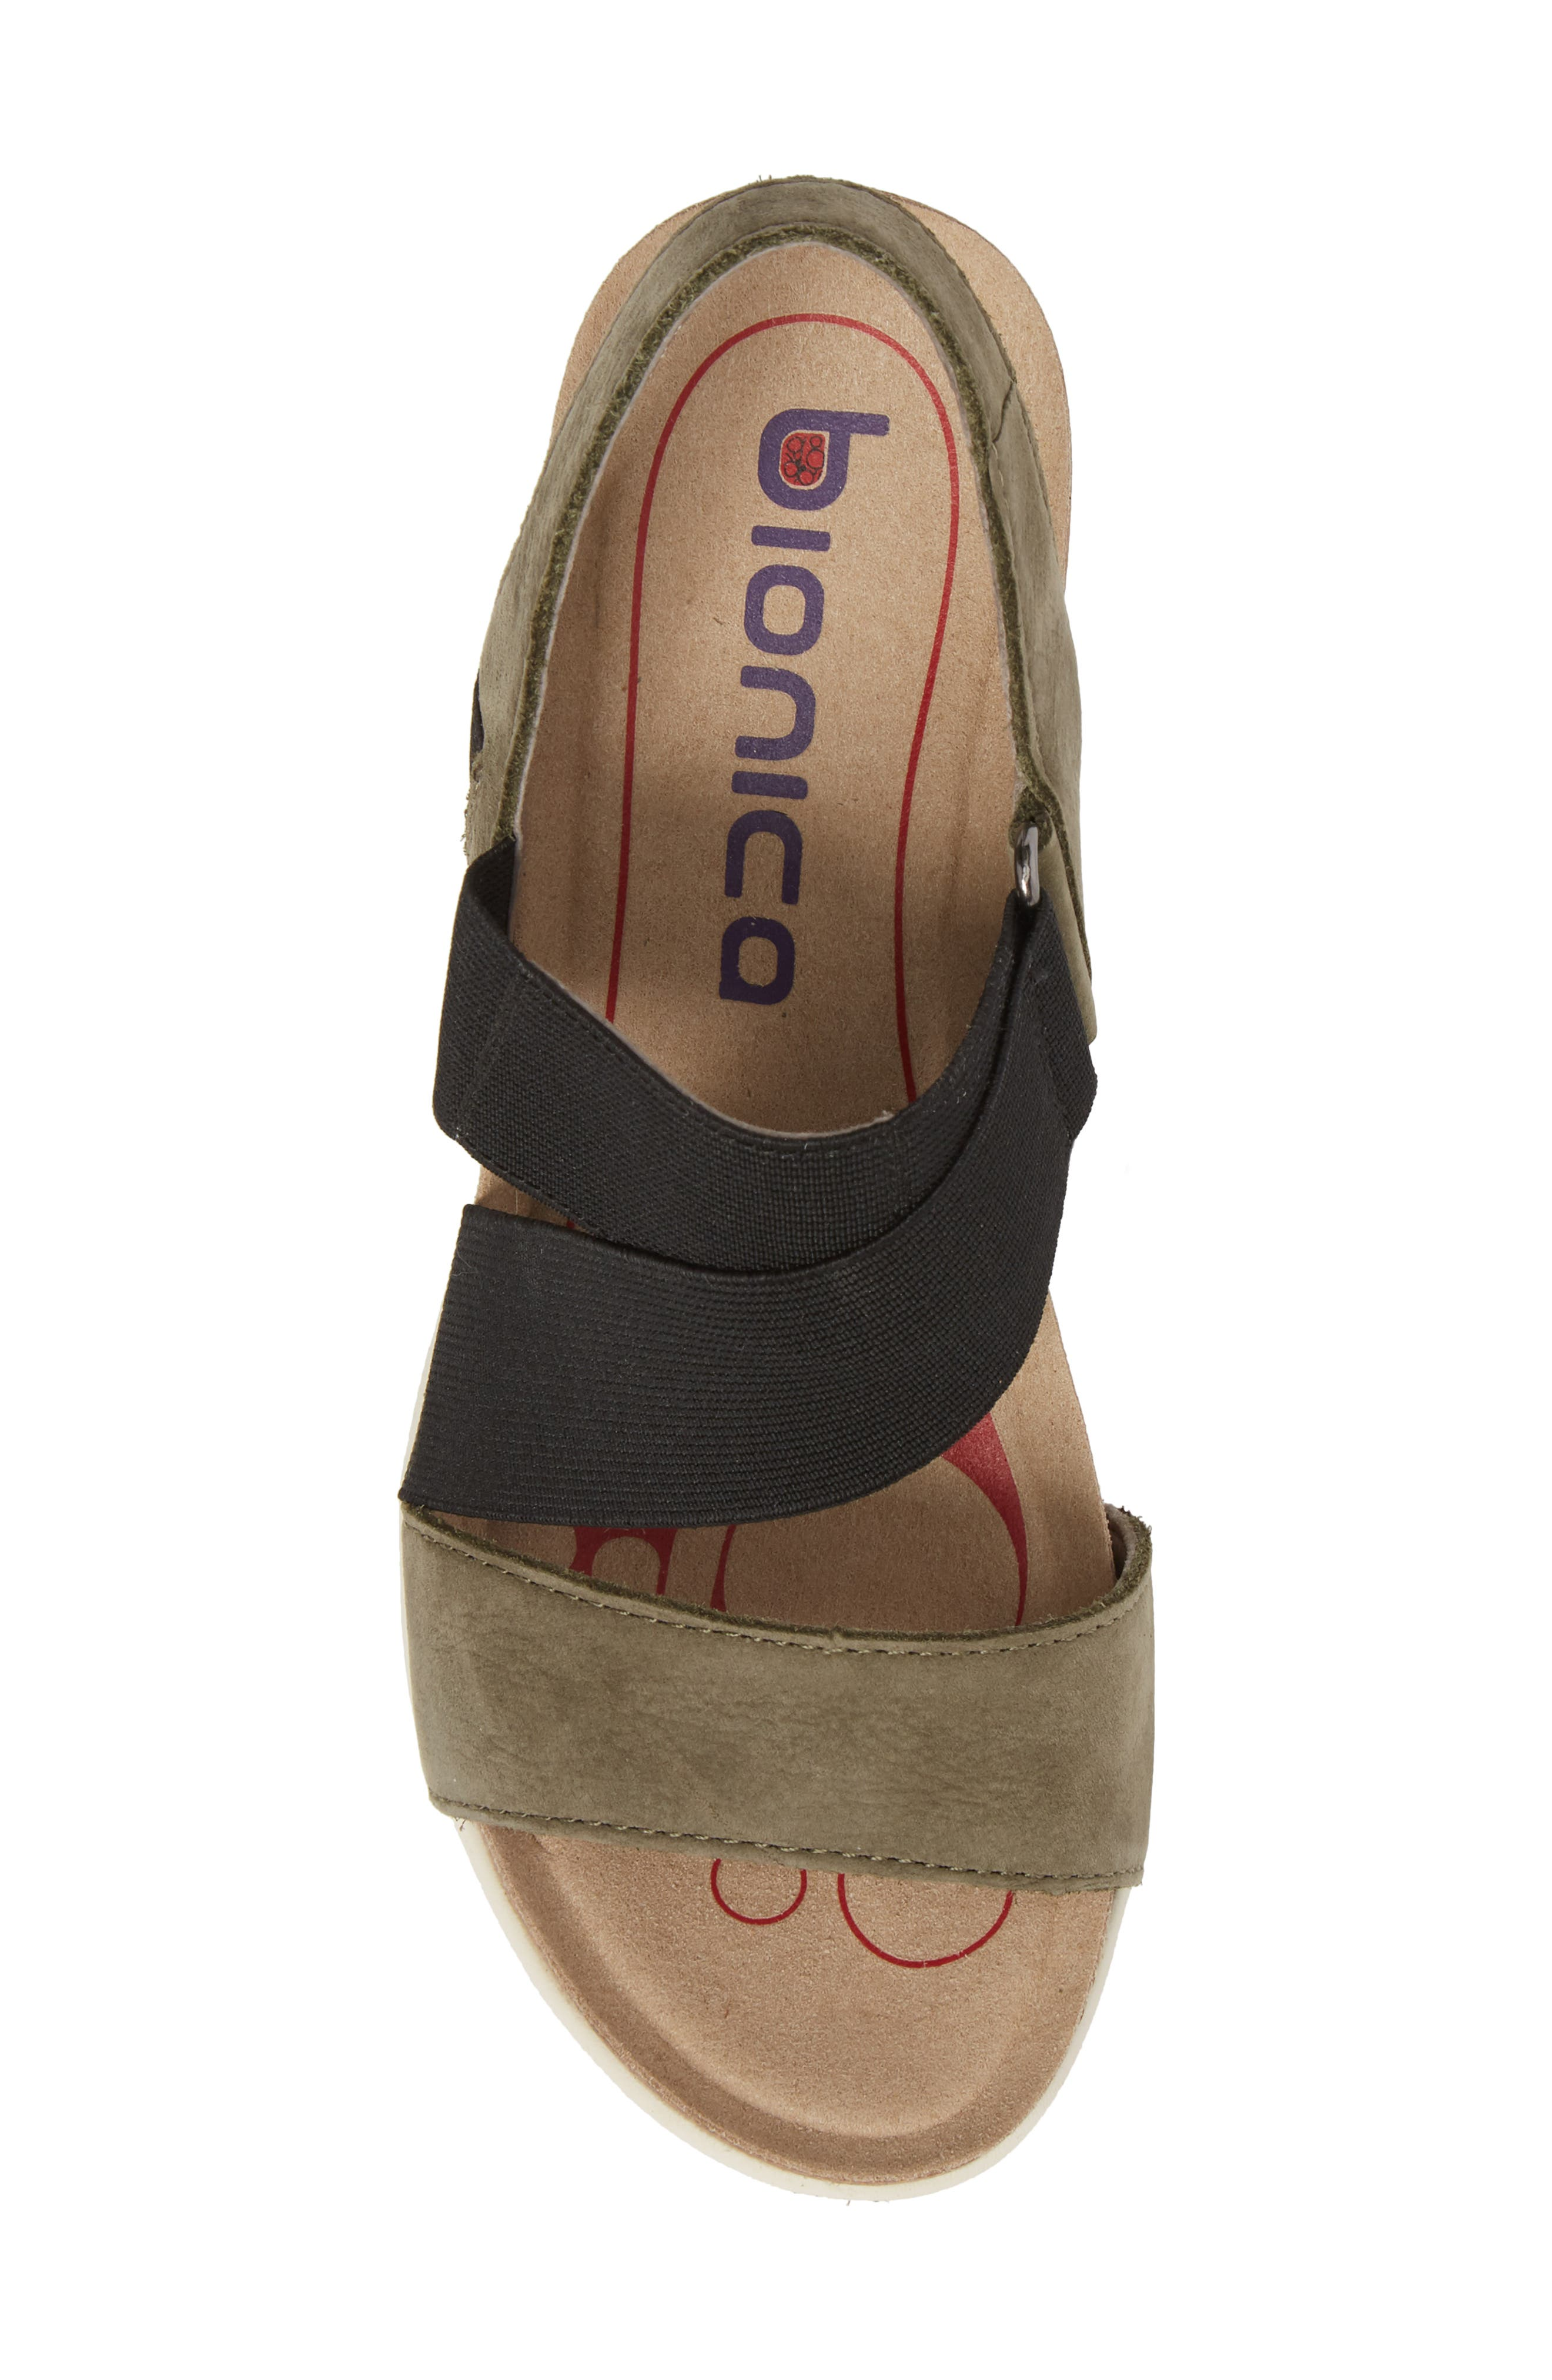 Paisley Wedge Sandal,                             Alternate thumbnail 19, color,